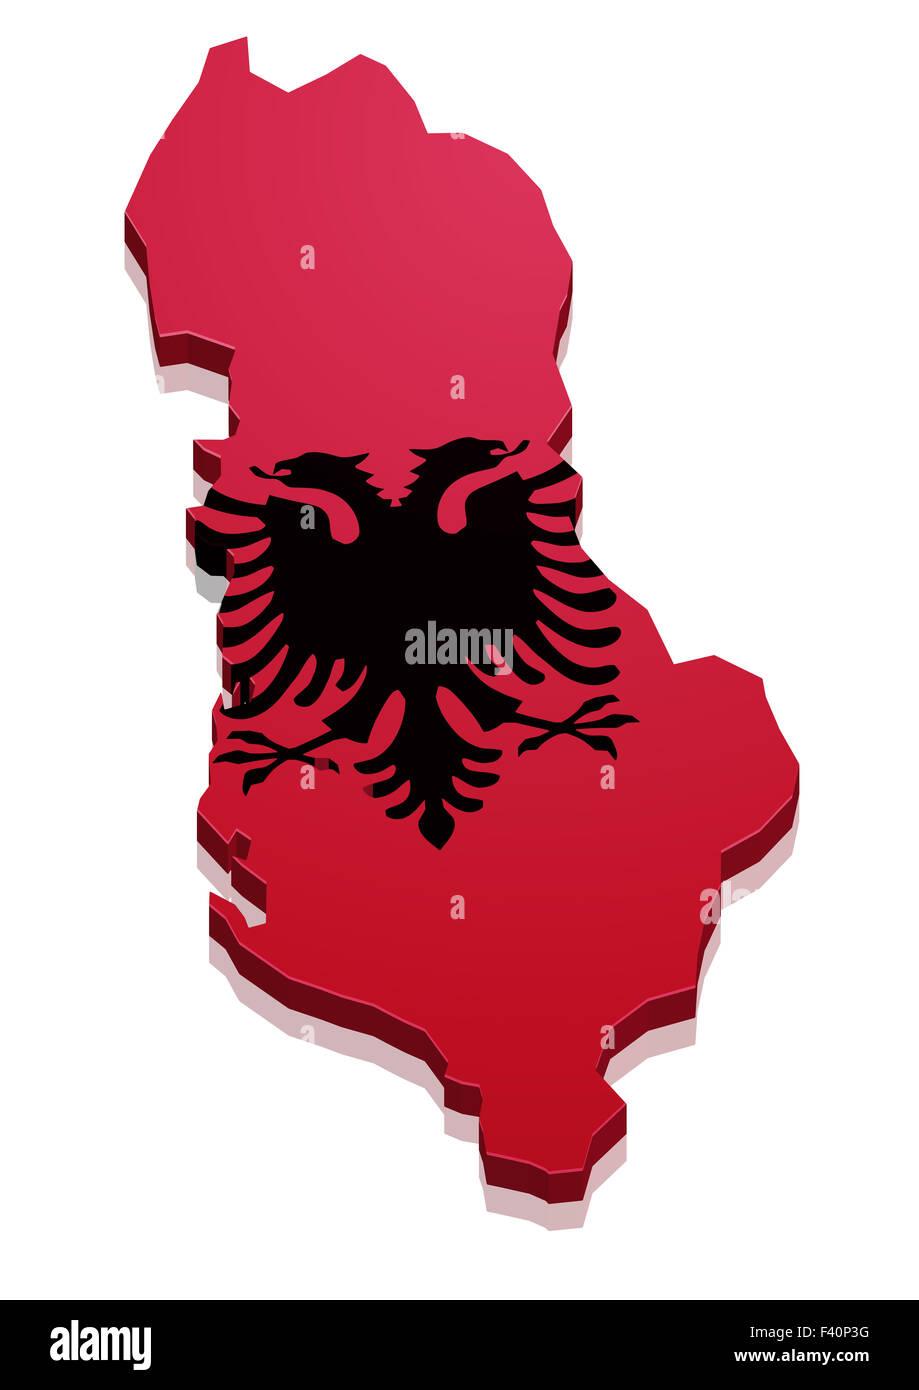 Map Albania - Stock Image